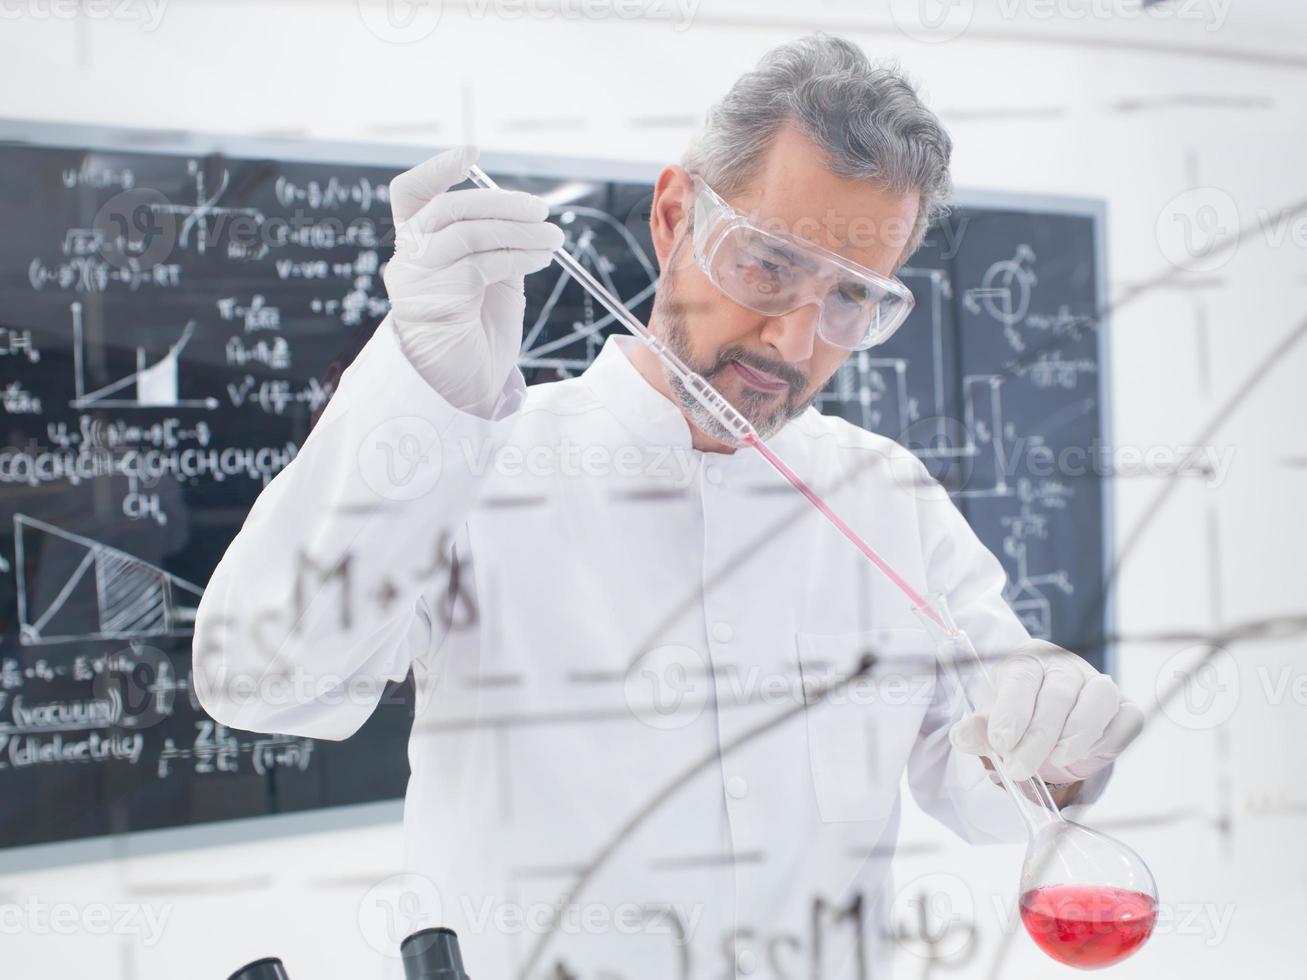 cientista conduzindo experimento foto